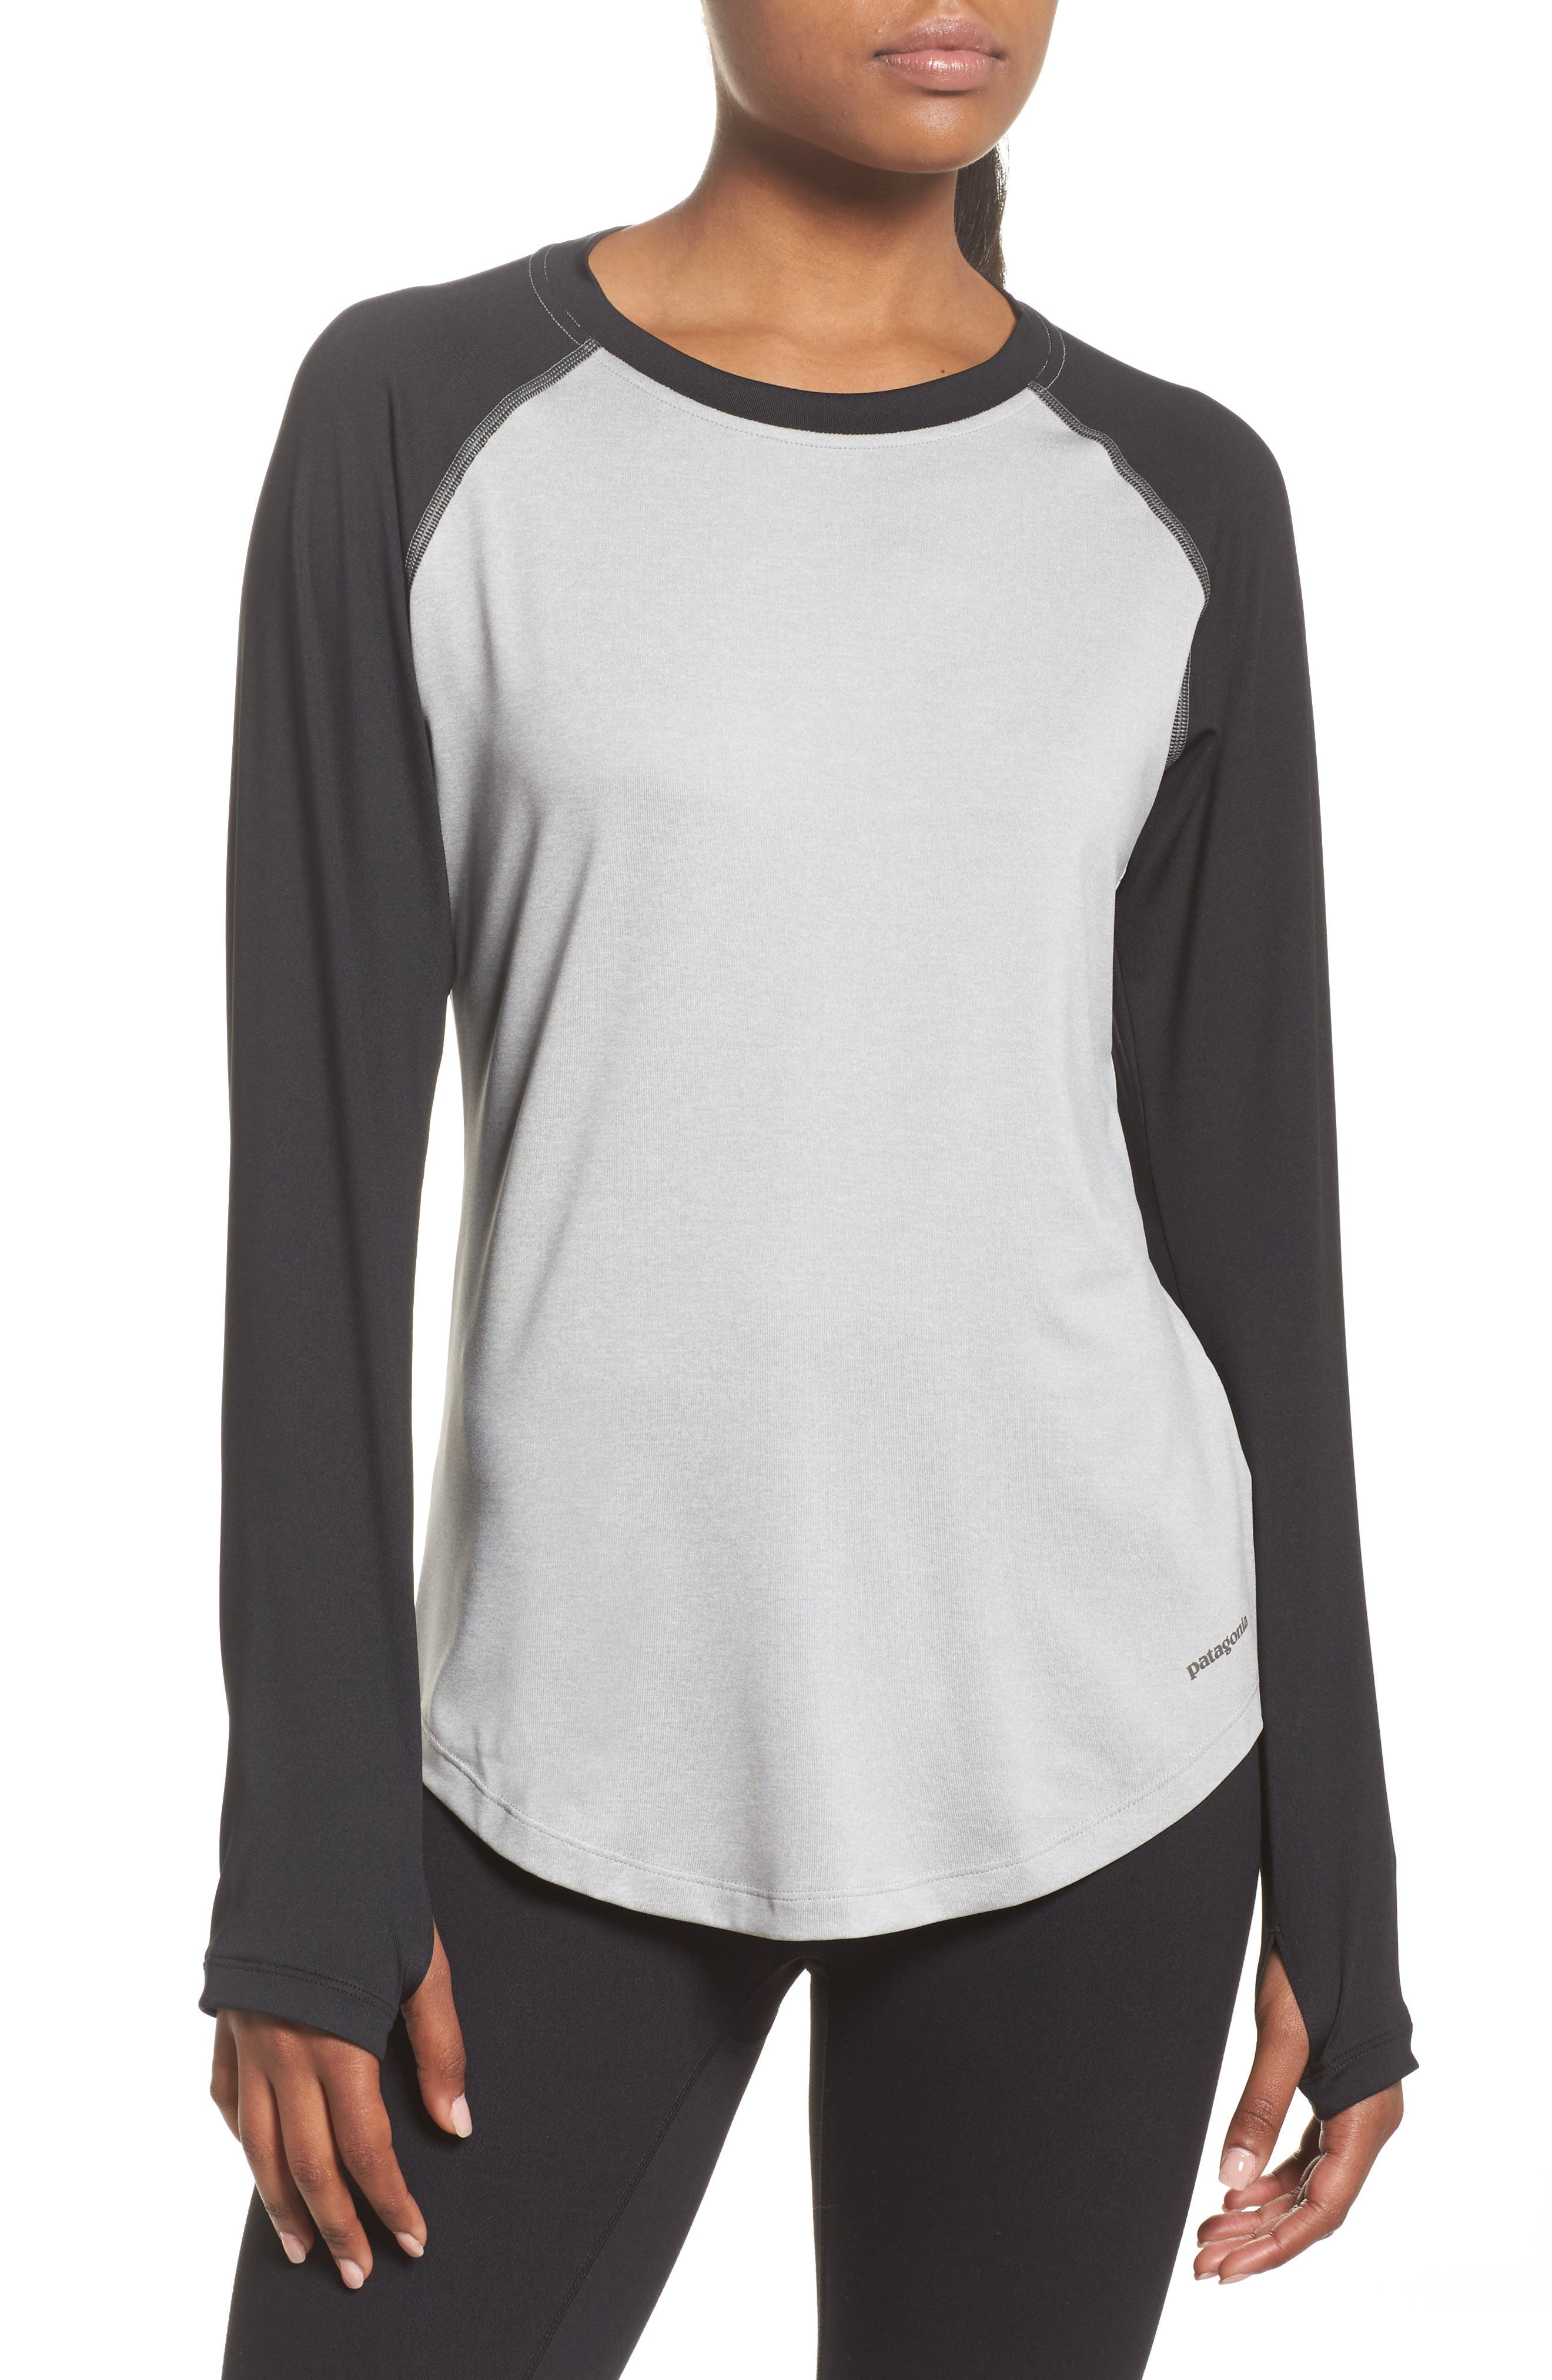 Tropic Comfort Shirt,                             Main thumbnail 1, color,                             021